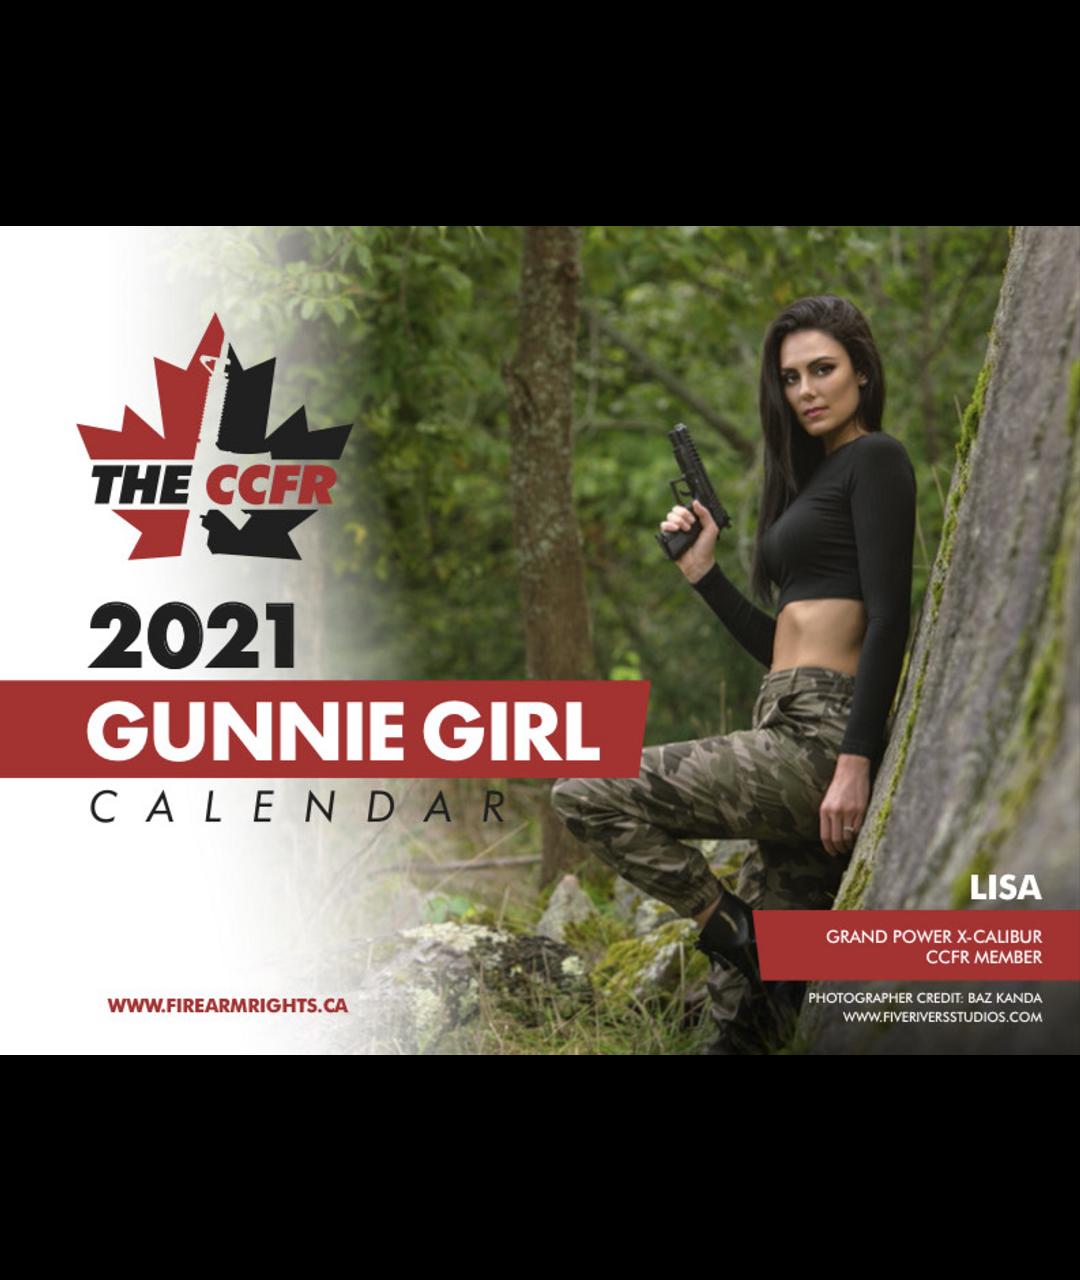 2021 CCFR Gunnie Girl Fundraising Calendar